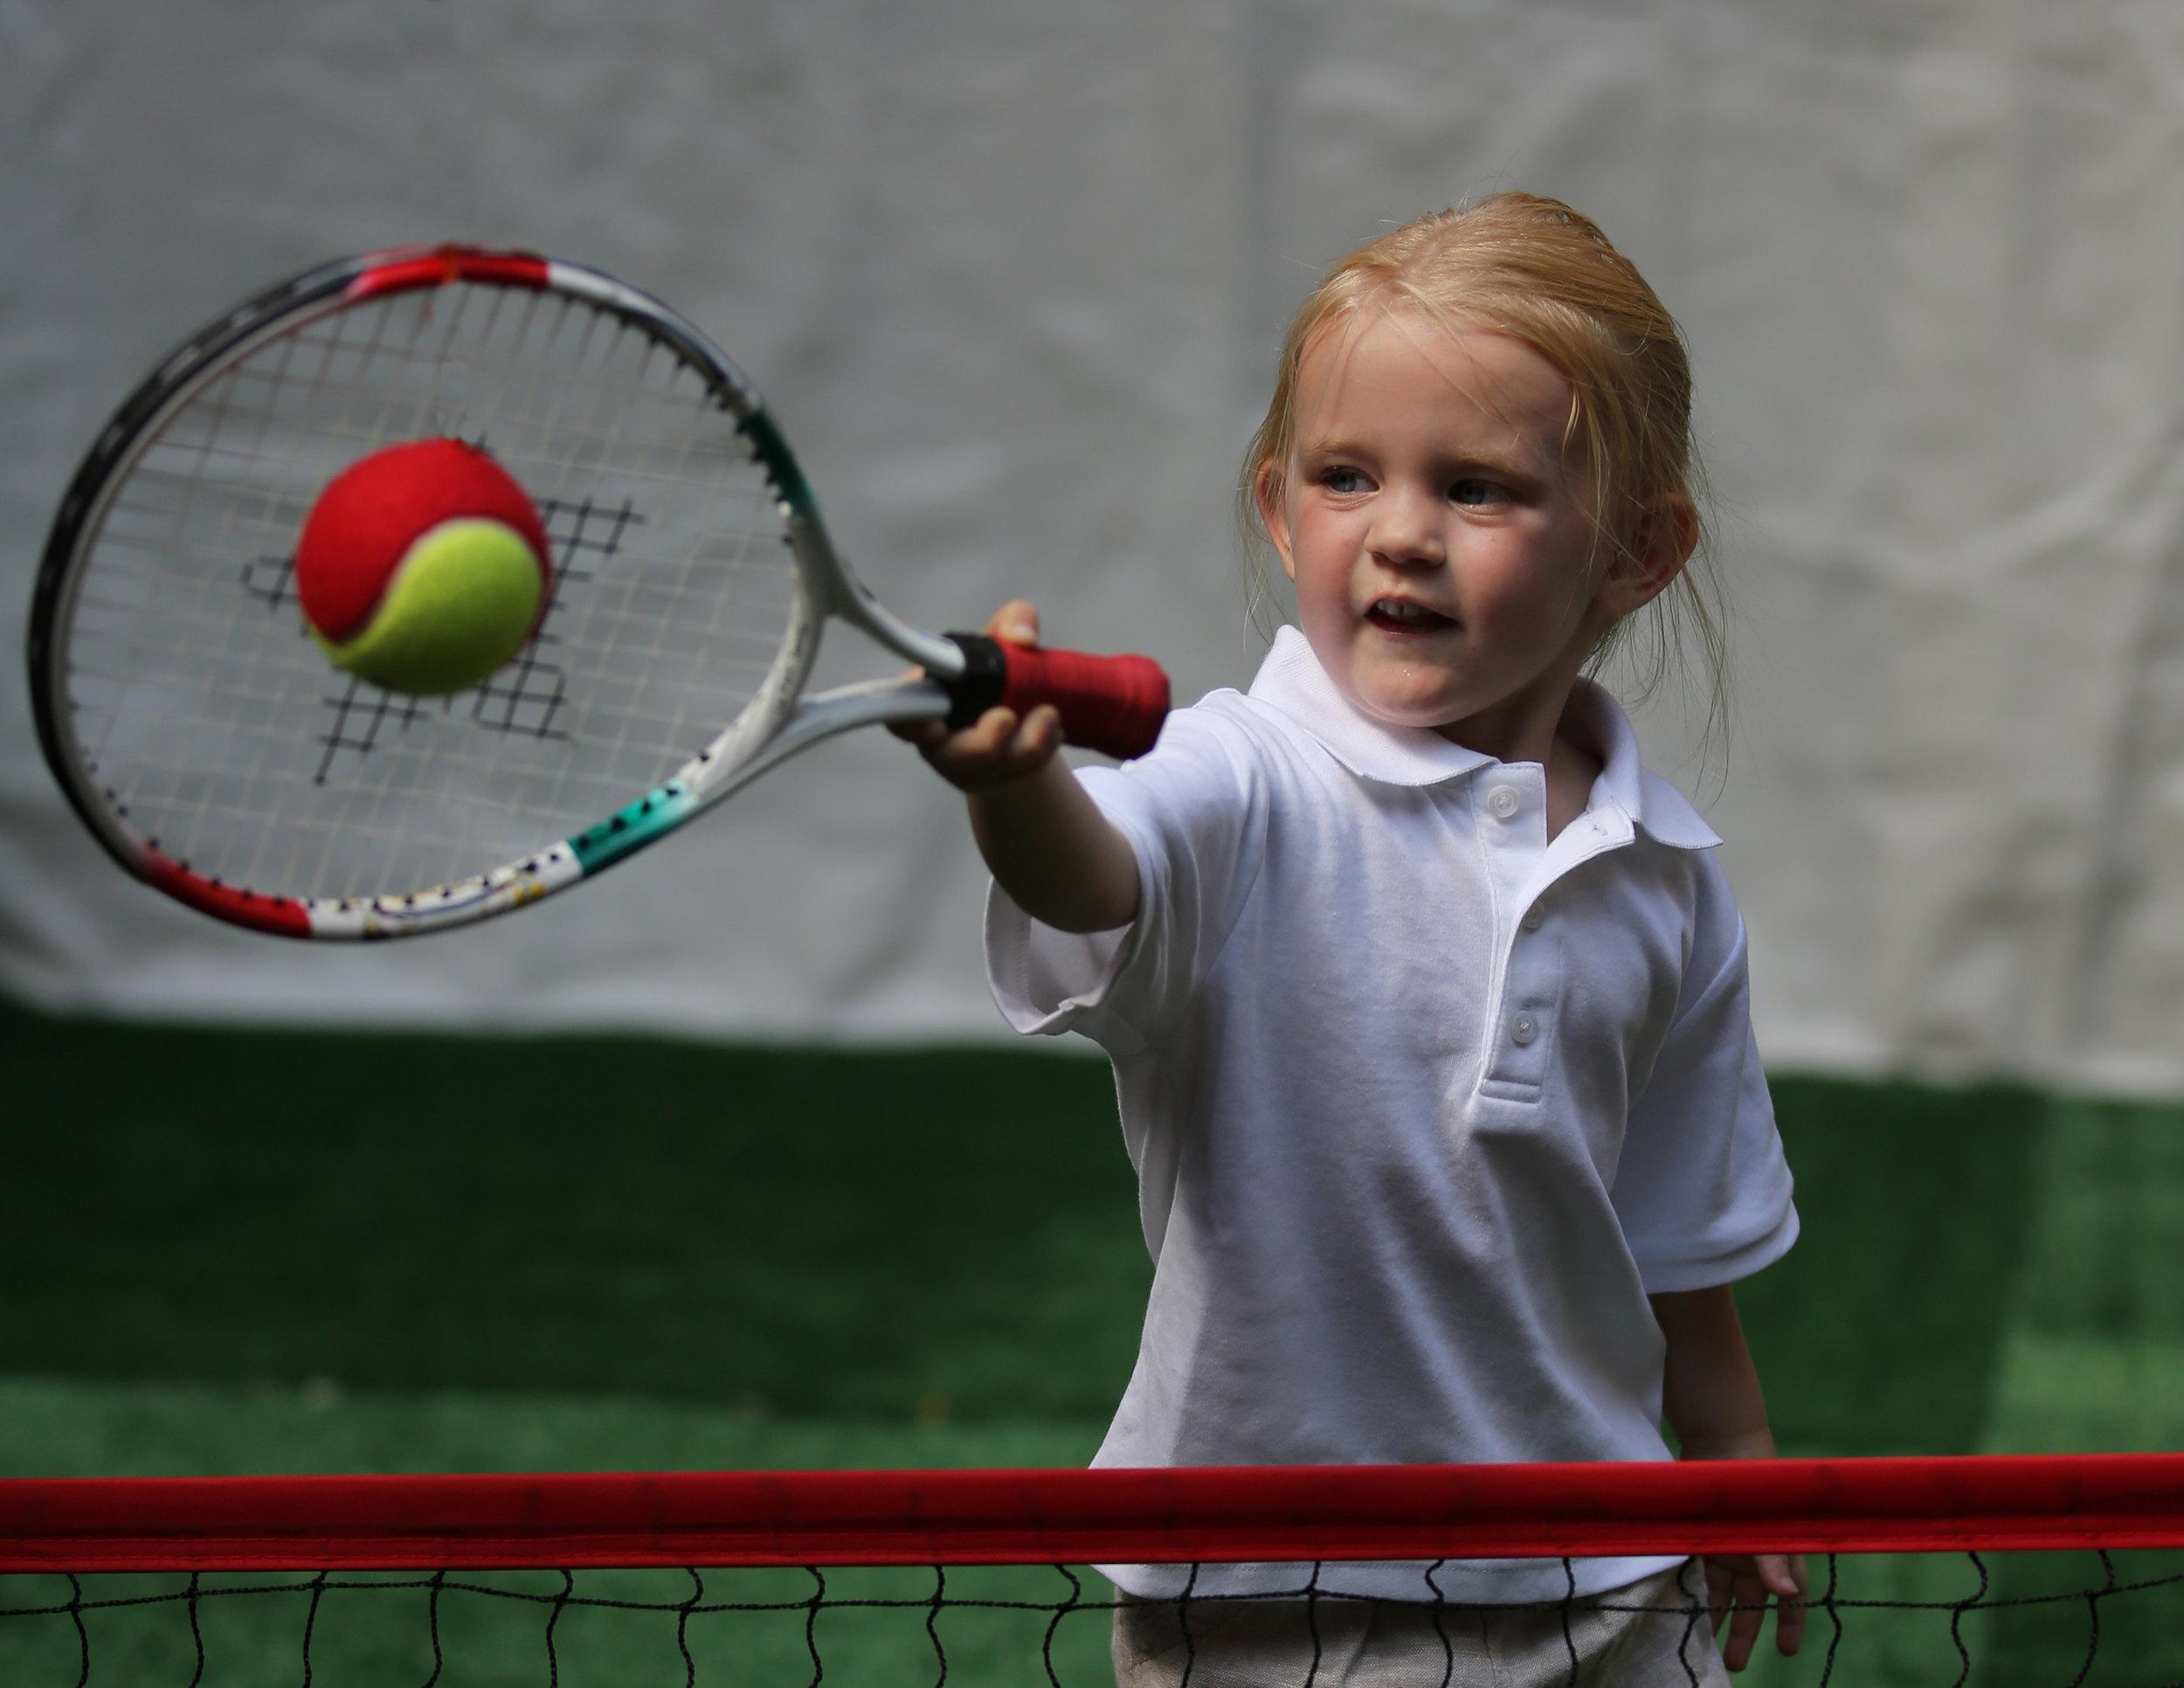 toddler tennis website.JPG